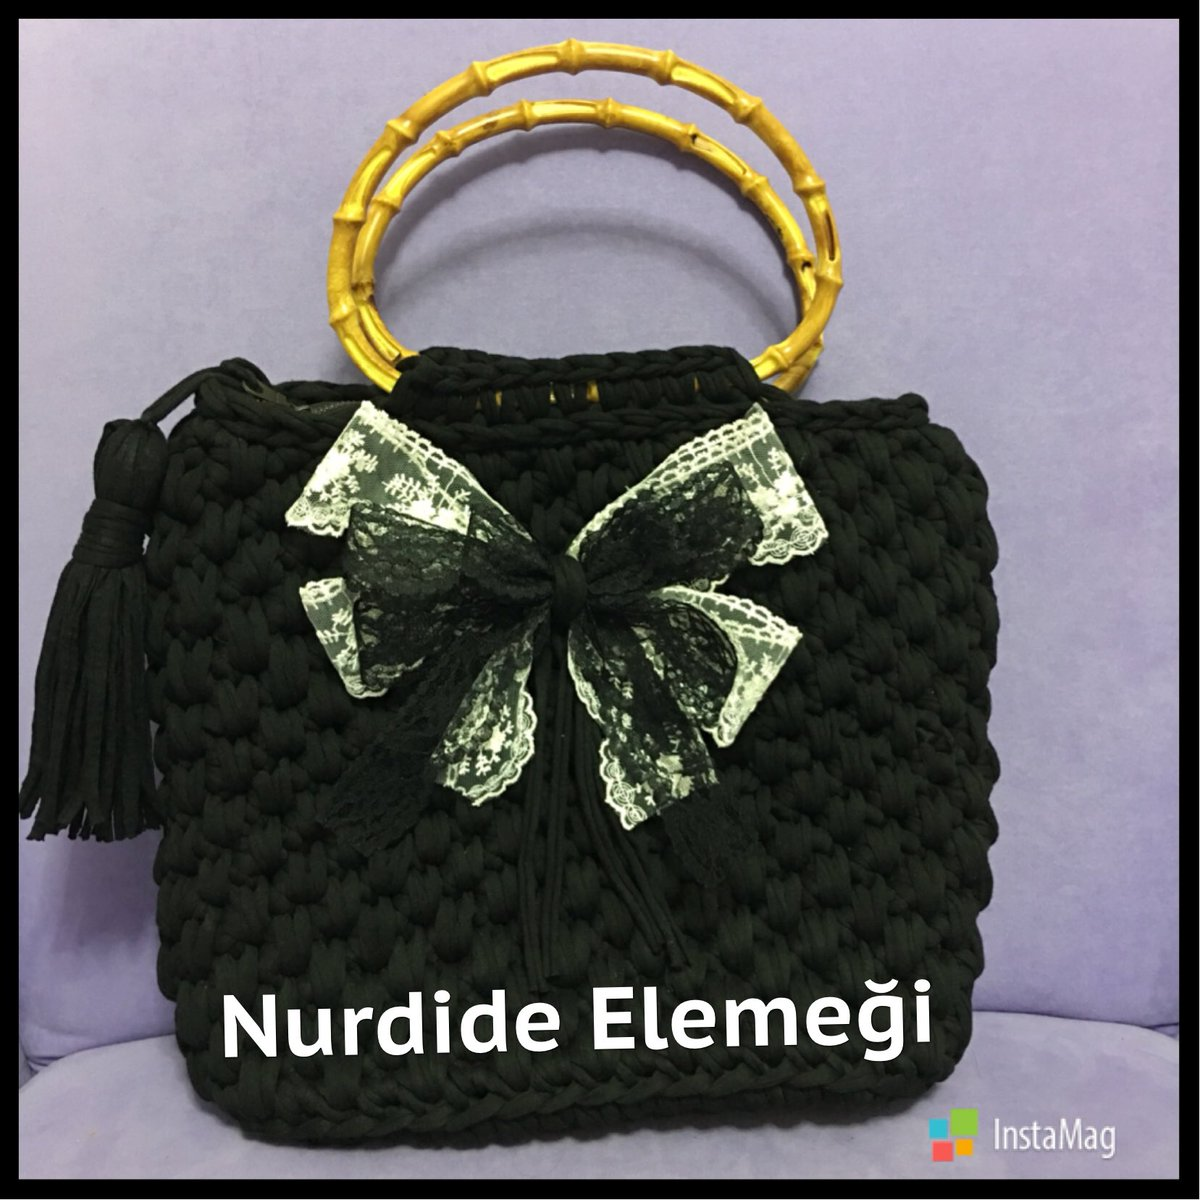 #bag #çanta <br>http://pic.twitter.com/y0YEGCBssi